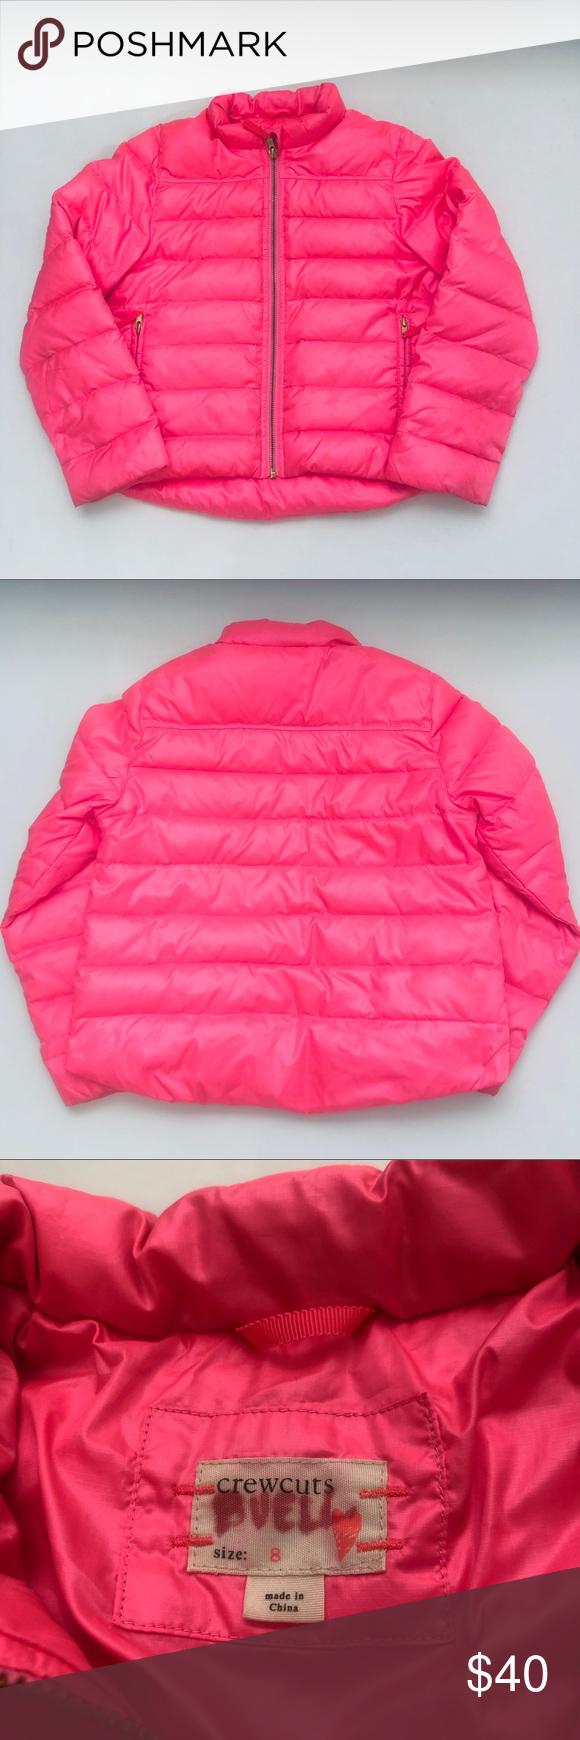 Crewcuts Shiny Down Puffer Hot Pink Jacket Pink Jacket Jackets Hot Pink [ 1740 x 580 Pixel ]